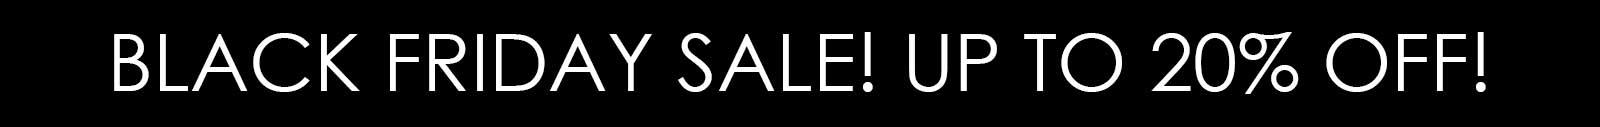 slim-banner-black-friday-sale-up-to-20-percent-off-black.jpg